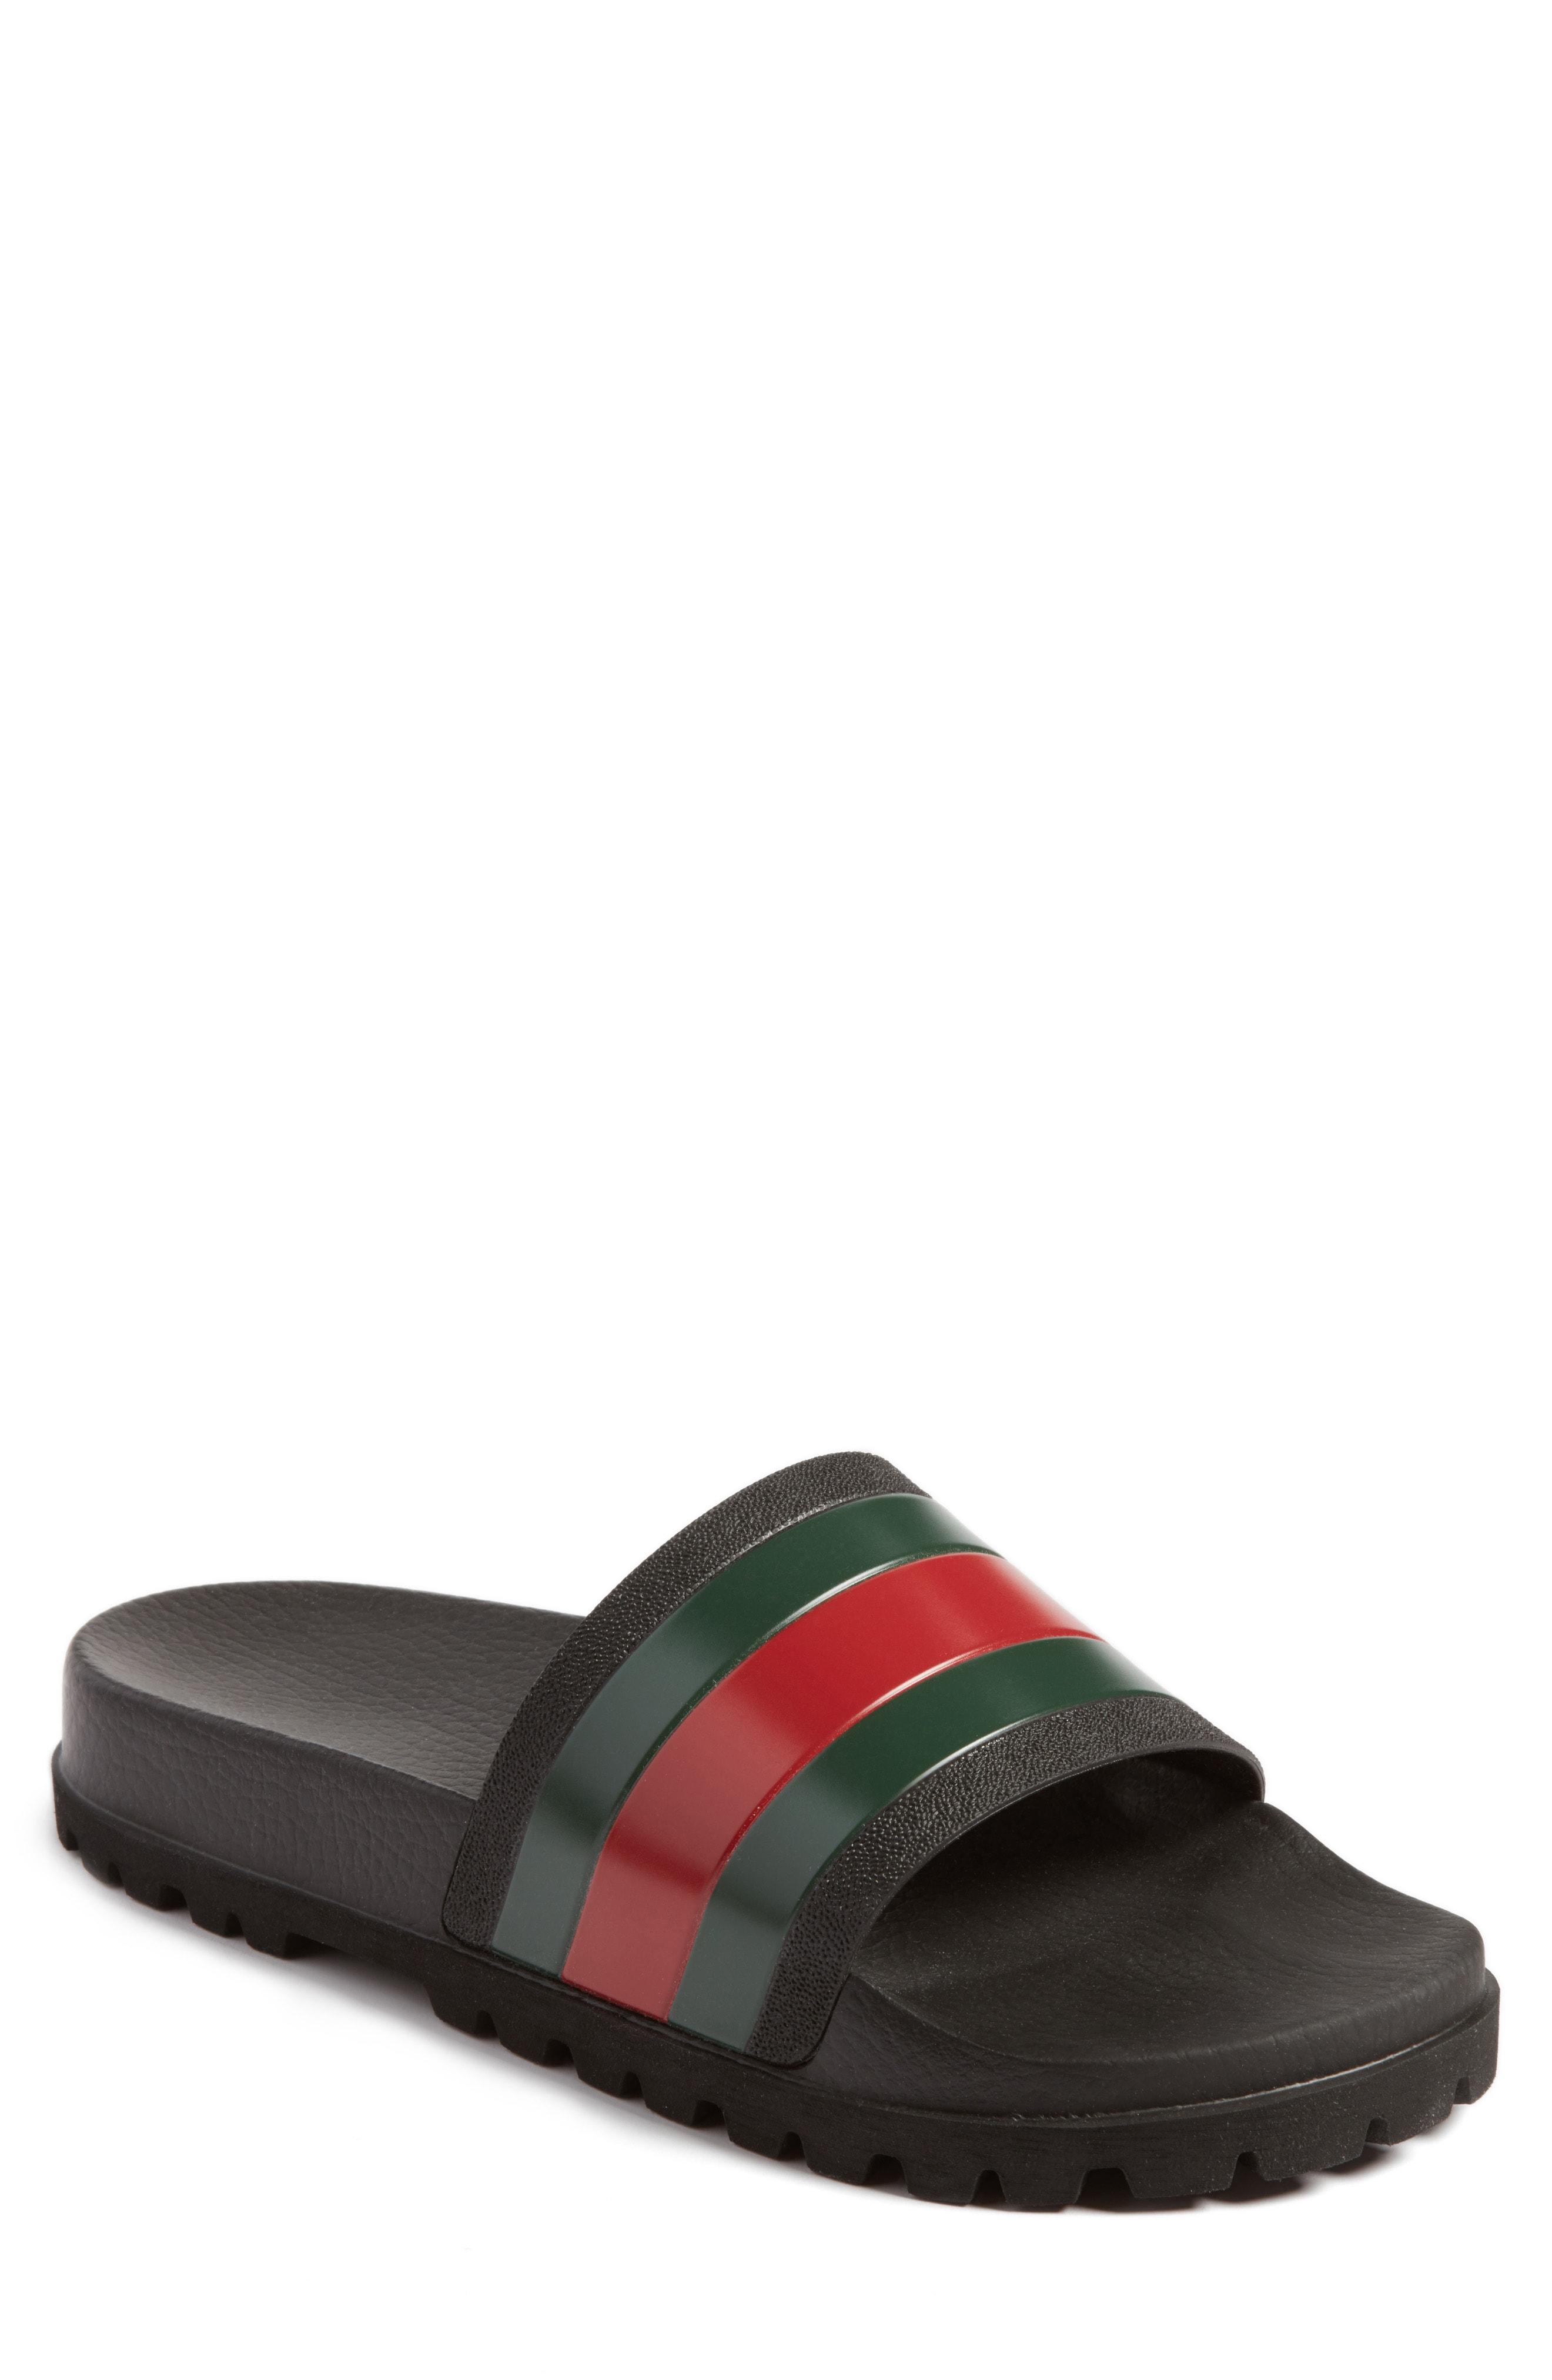 1119c7e35 Men's Gucci 'Pursuit Treck' Slide Sandal, Size 7US / 6UK – Black | The  Fashionisto